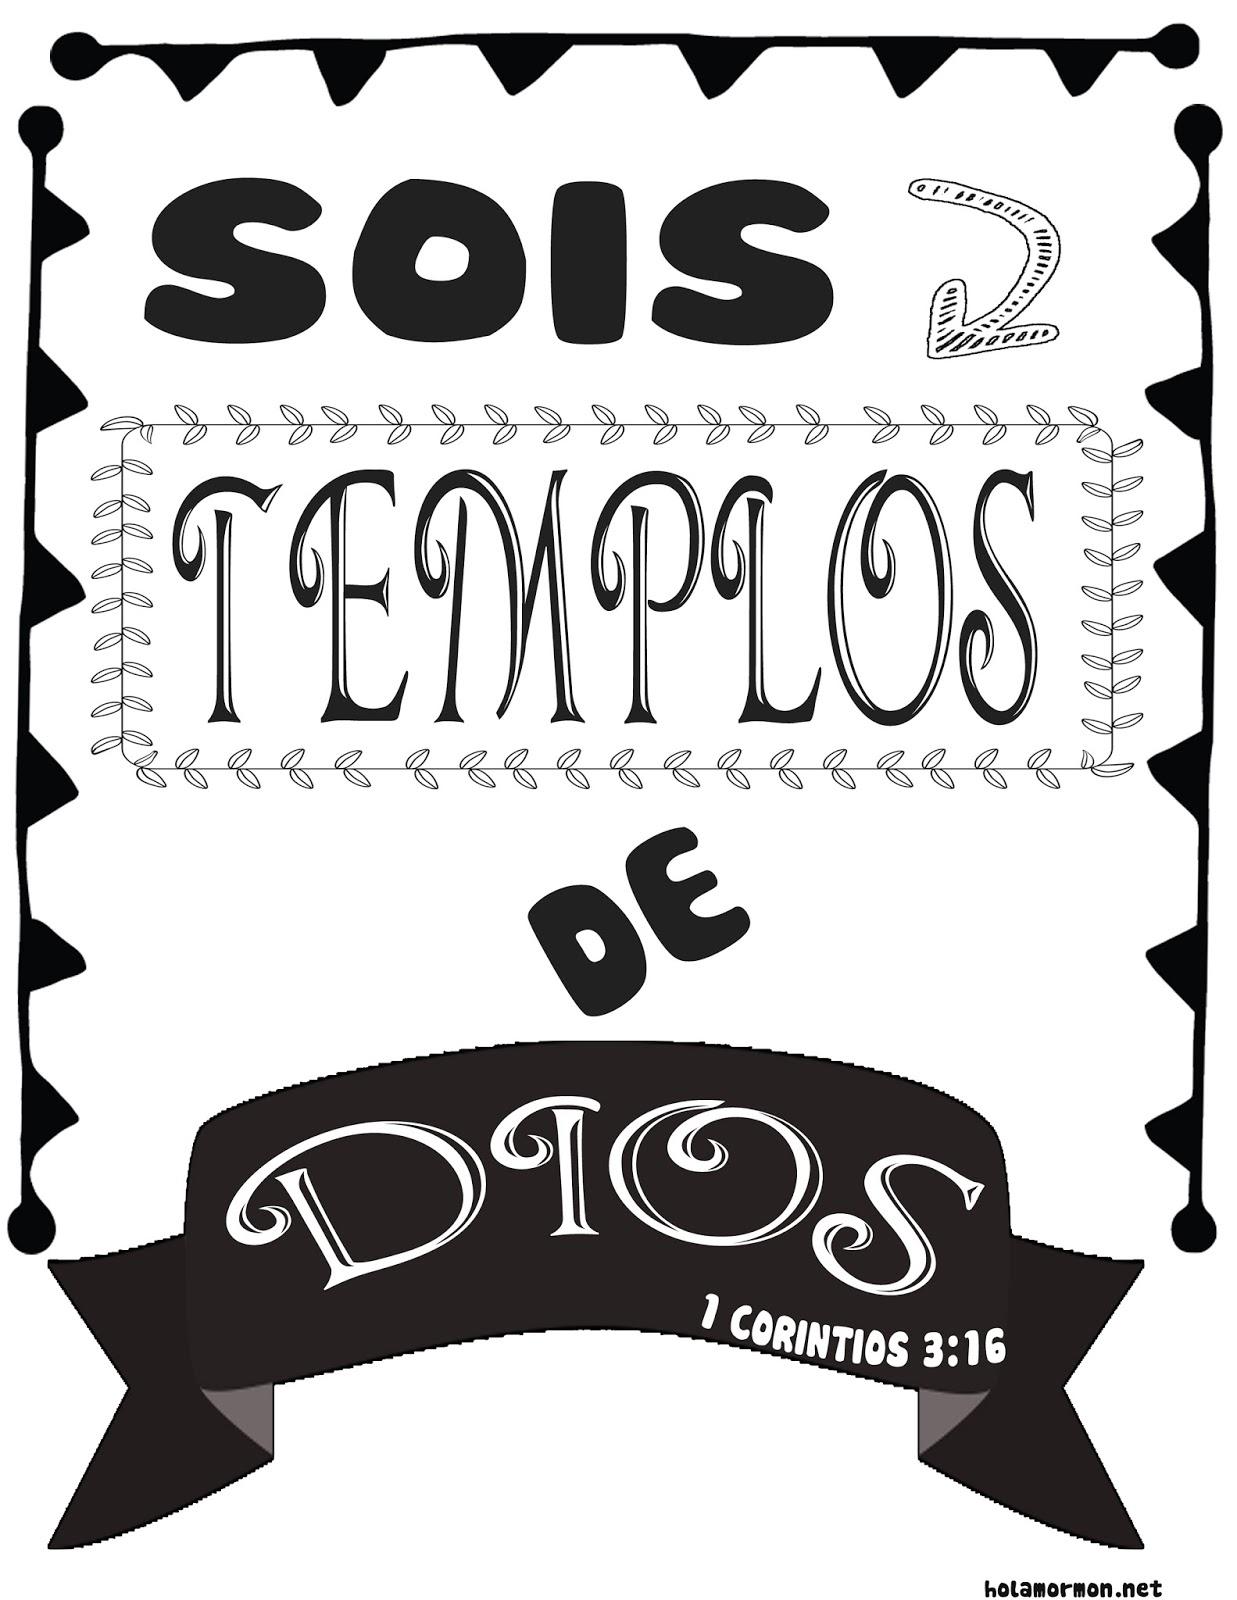 holamormon3: TIEMPO PARA COMPARTIR AGOSTO 2016